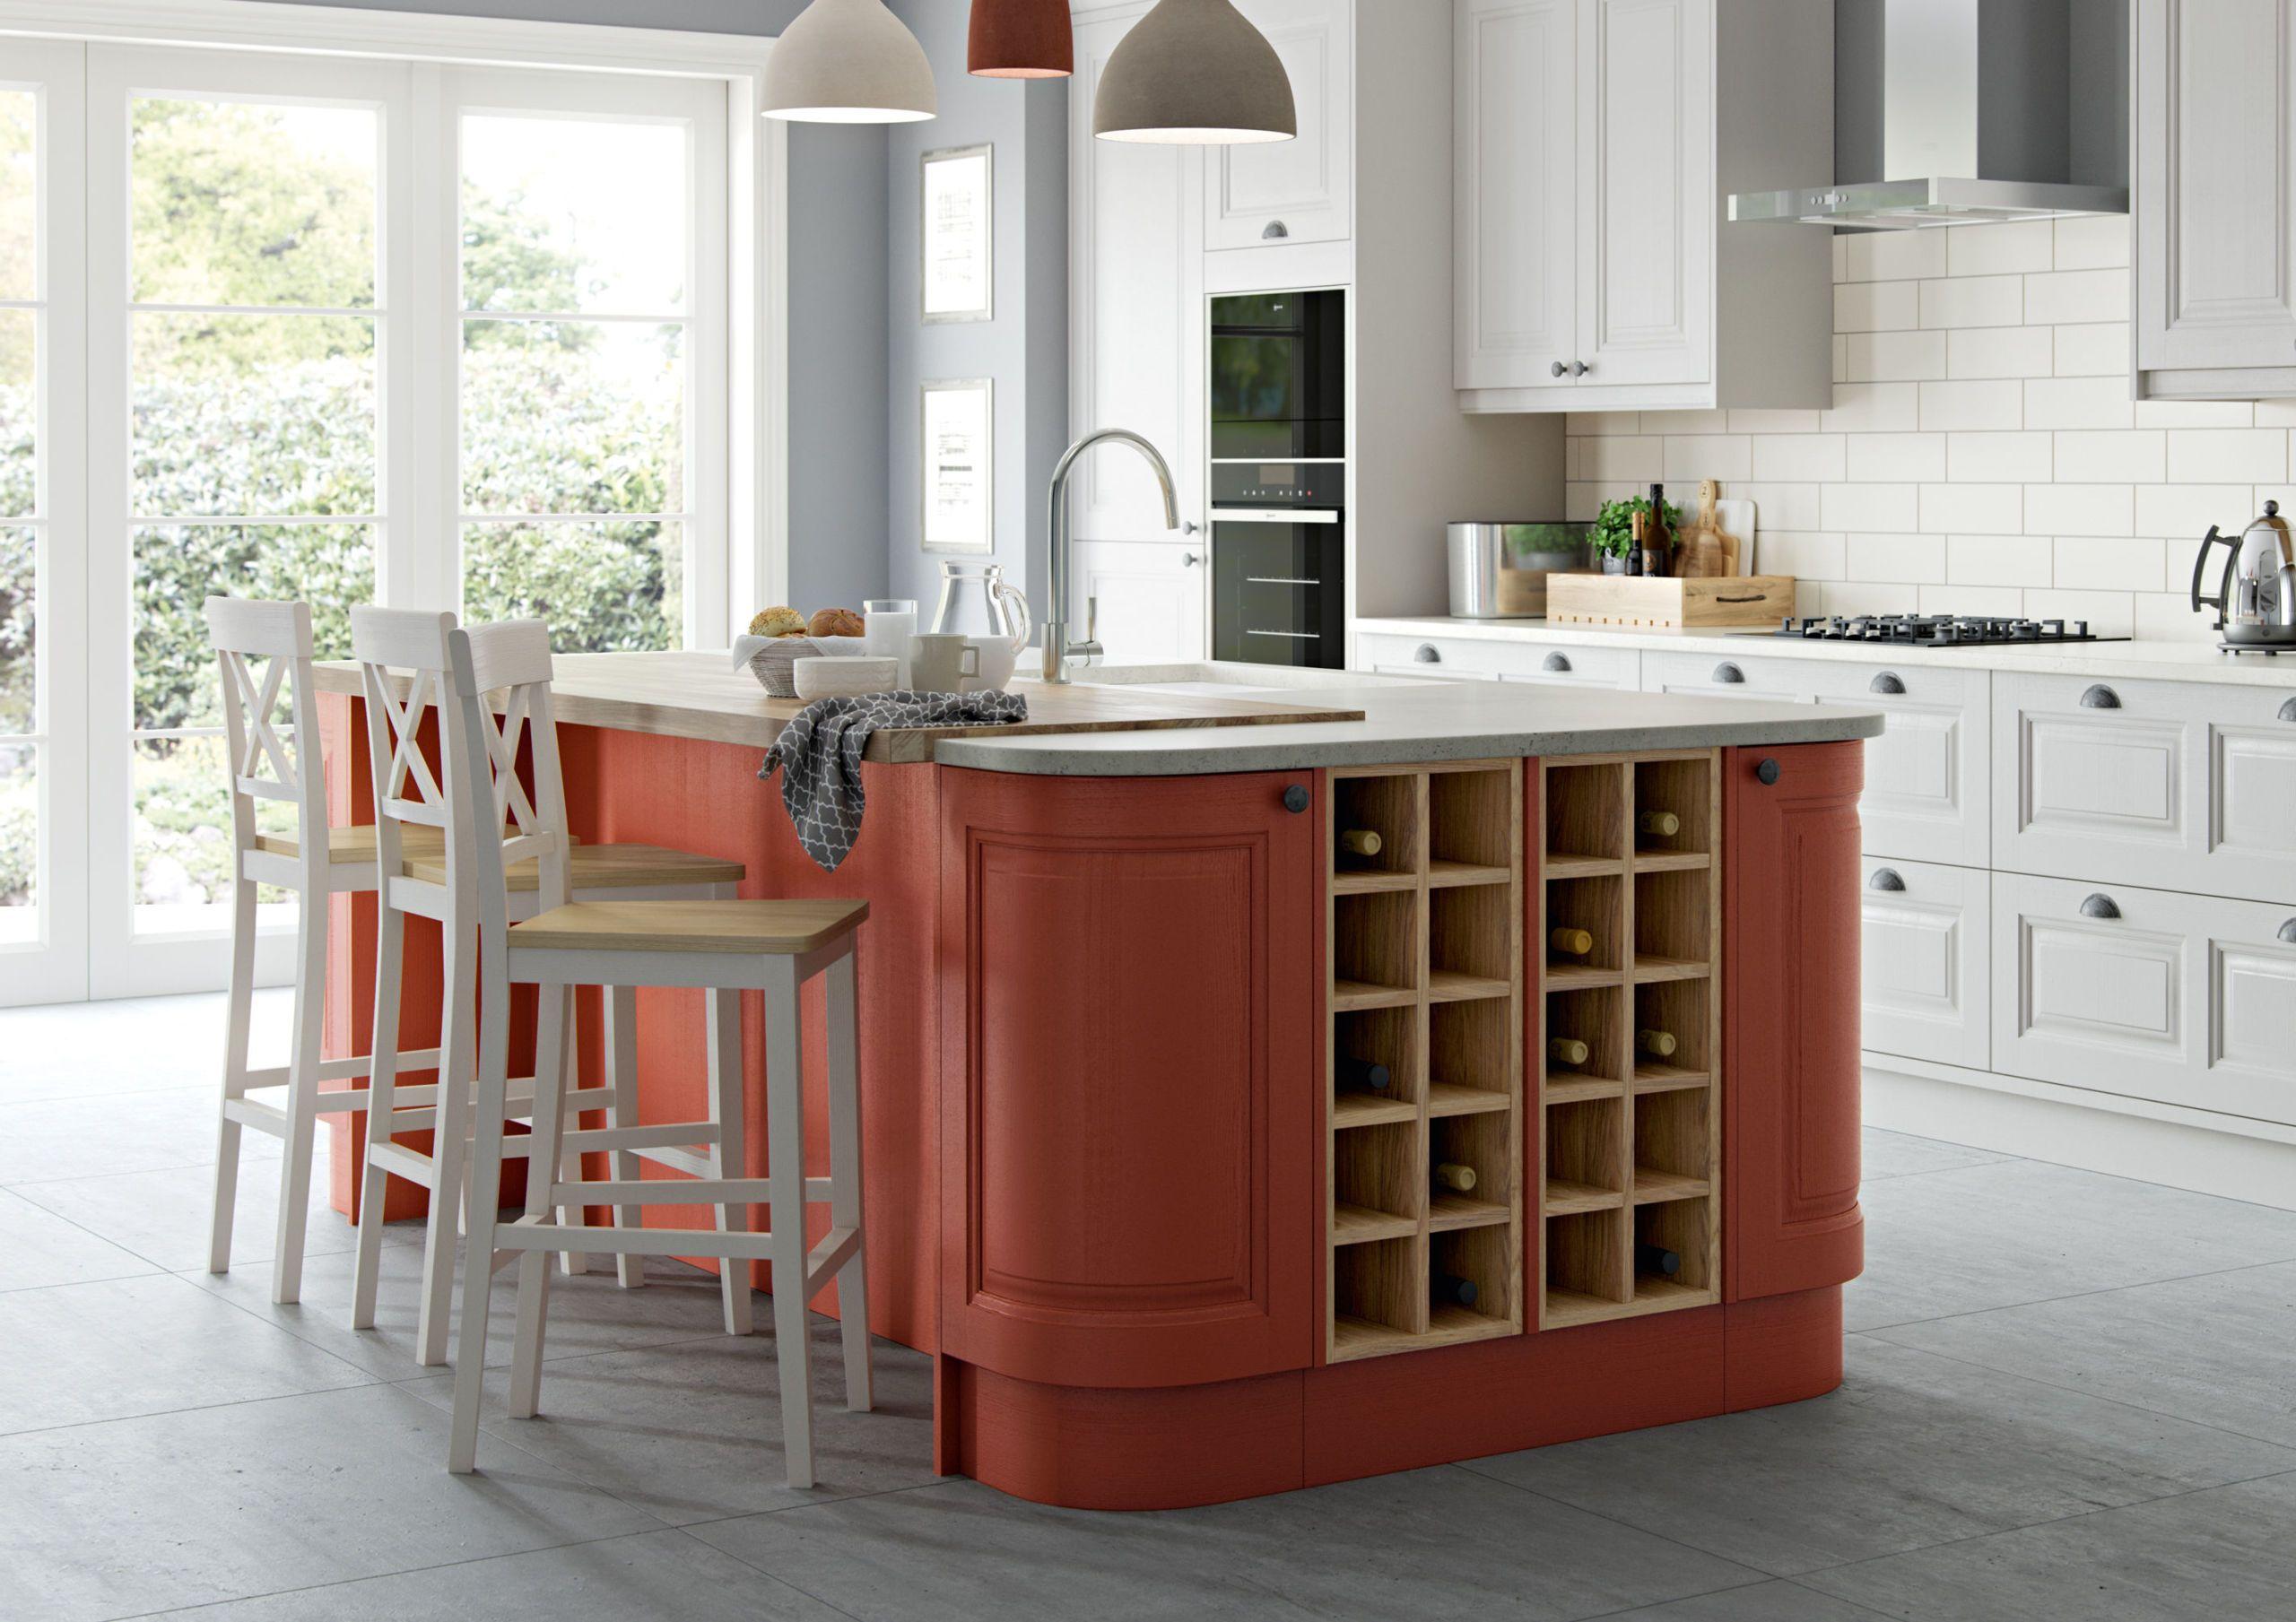 Masterclass Kitchens   Scotts Grey And Terracotta Sunset Colour Scheme    Carnegie Kitchen